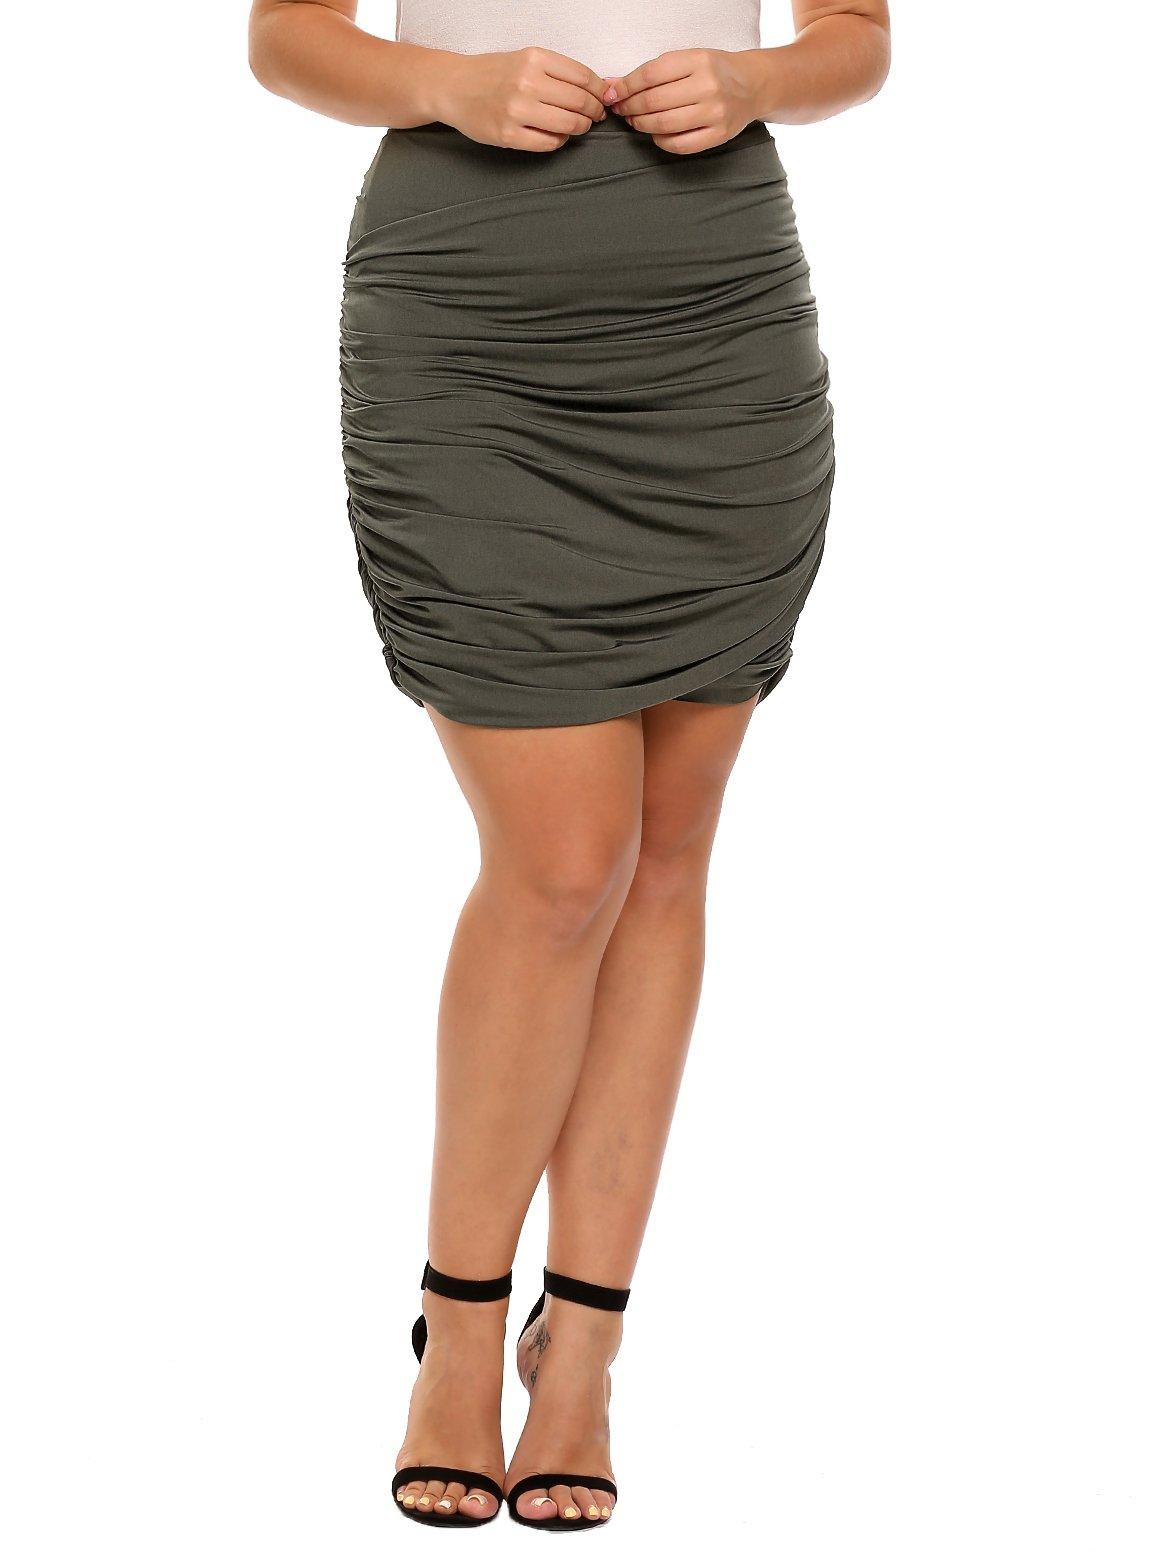 zeagoo Plus Size Women Stretchy Bodycon Ruched Mini Pencil Skirt,Army Green,4X